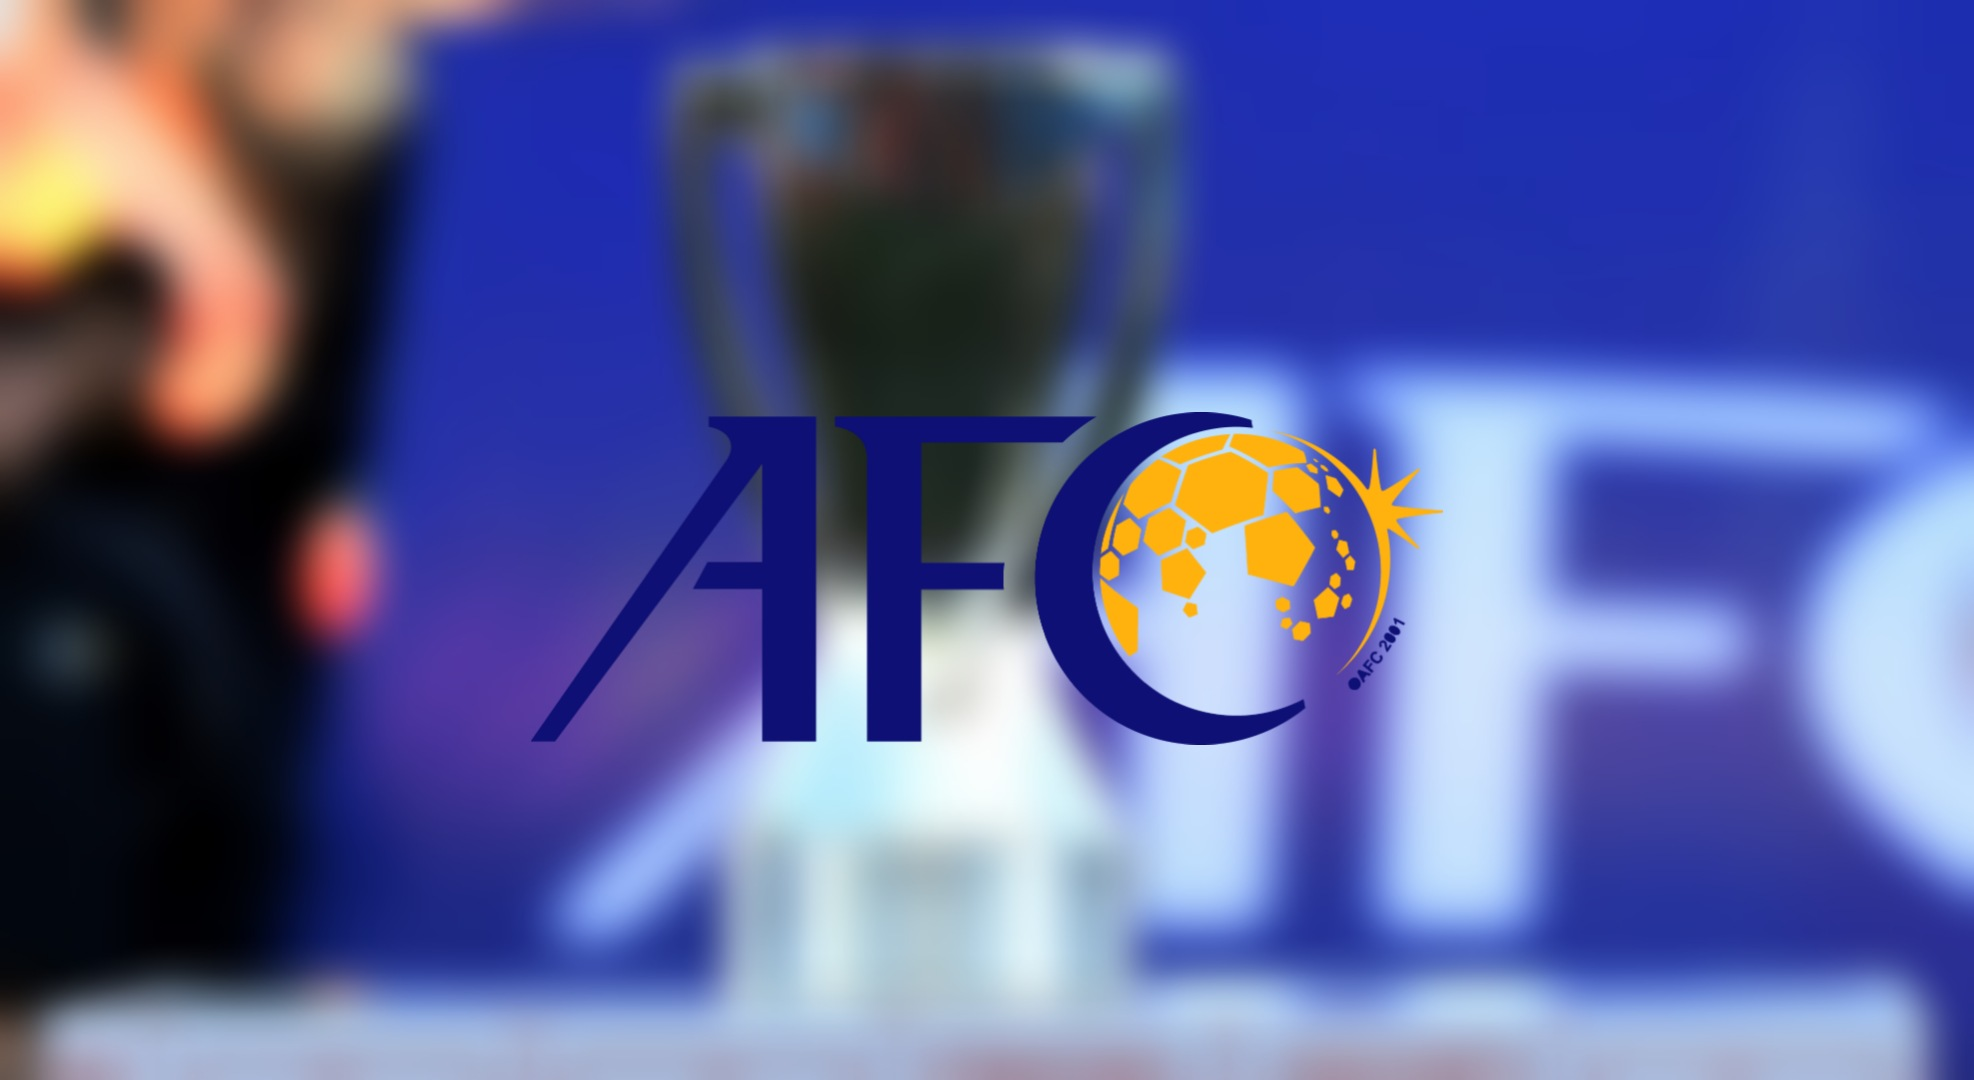 Jadual Kelayakan Piala Asia B-23 2022 Malaysia (Keputusan)